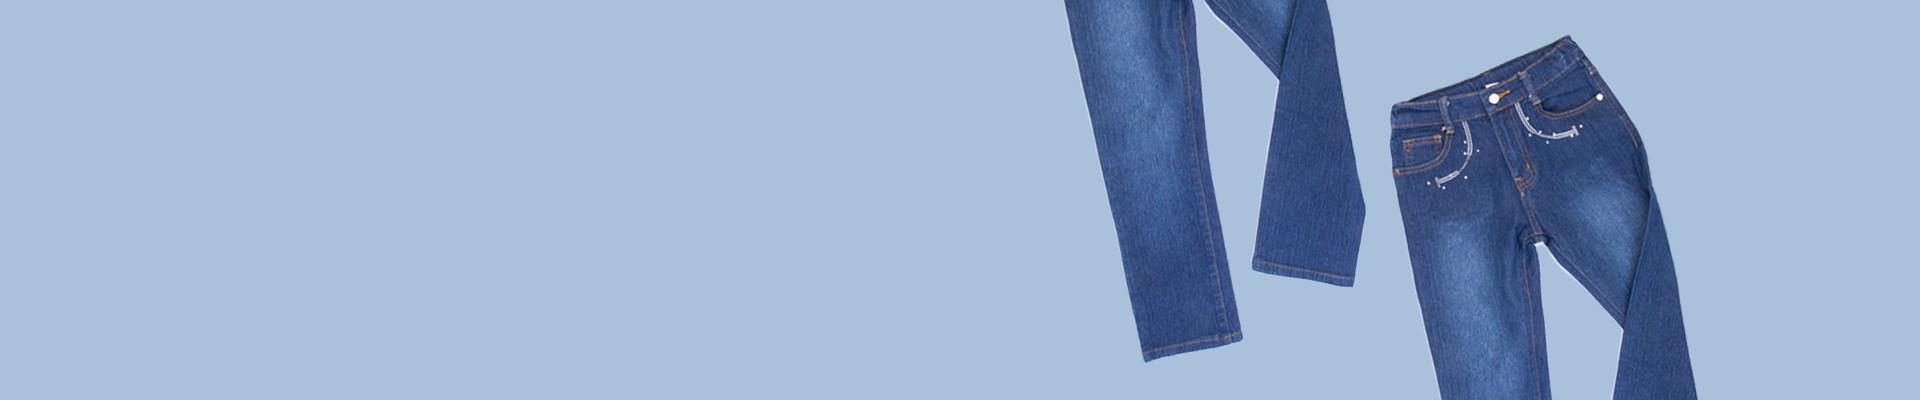 Jual Model Celana Jeans Anak Laki-Laki Terbaru